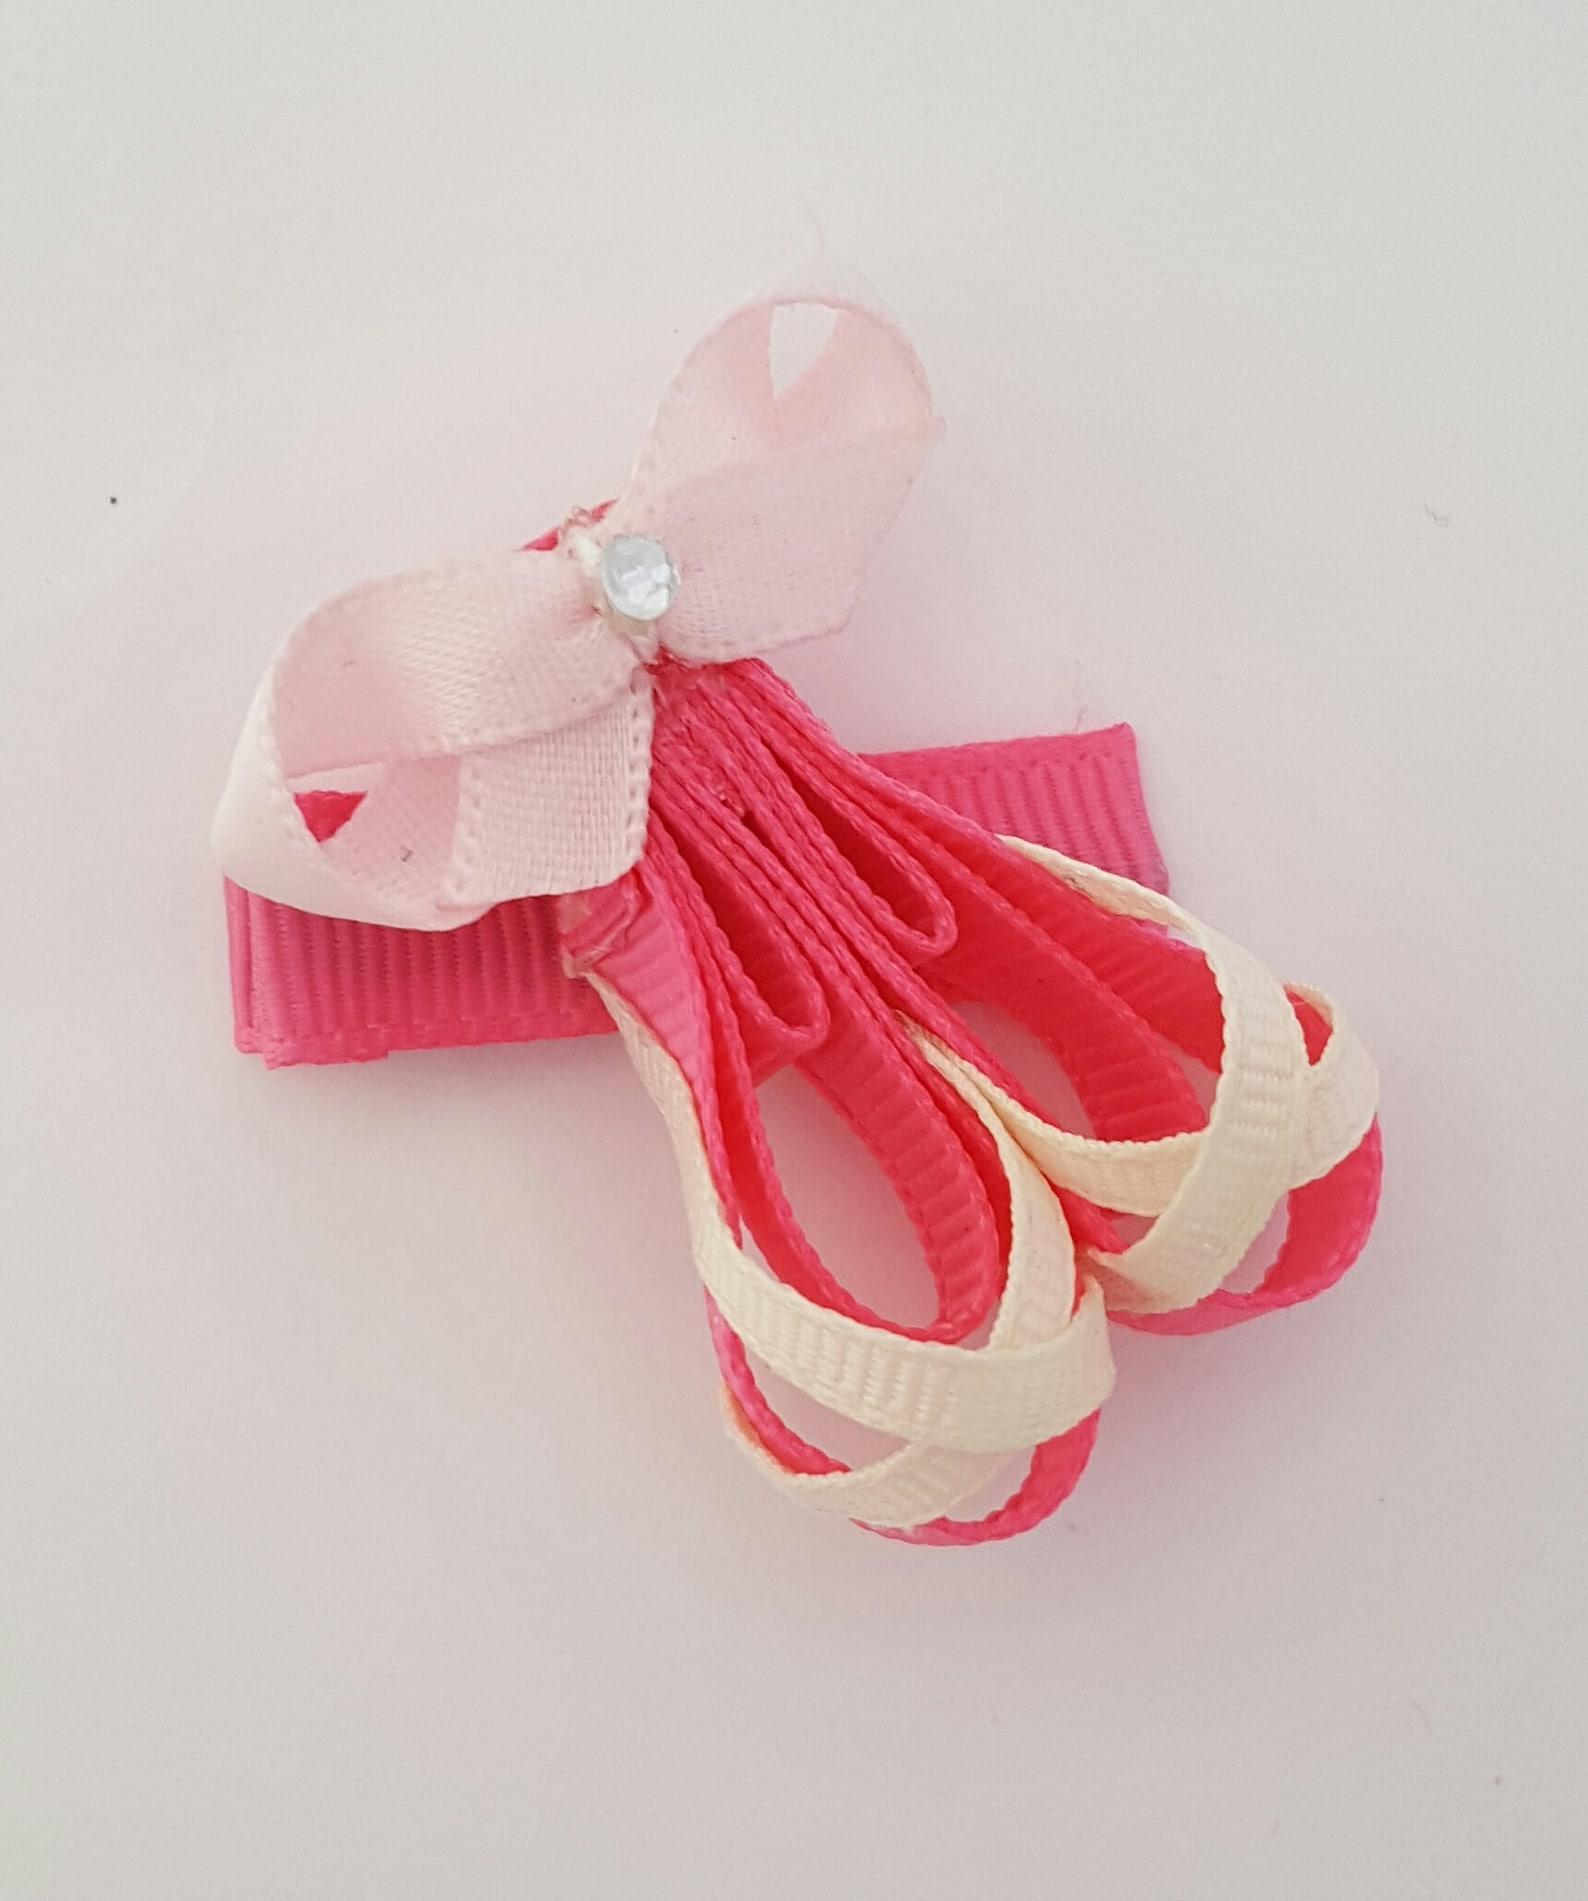 barrette anti-slip ballet shoes